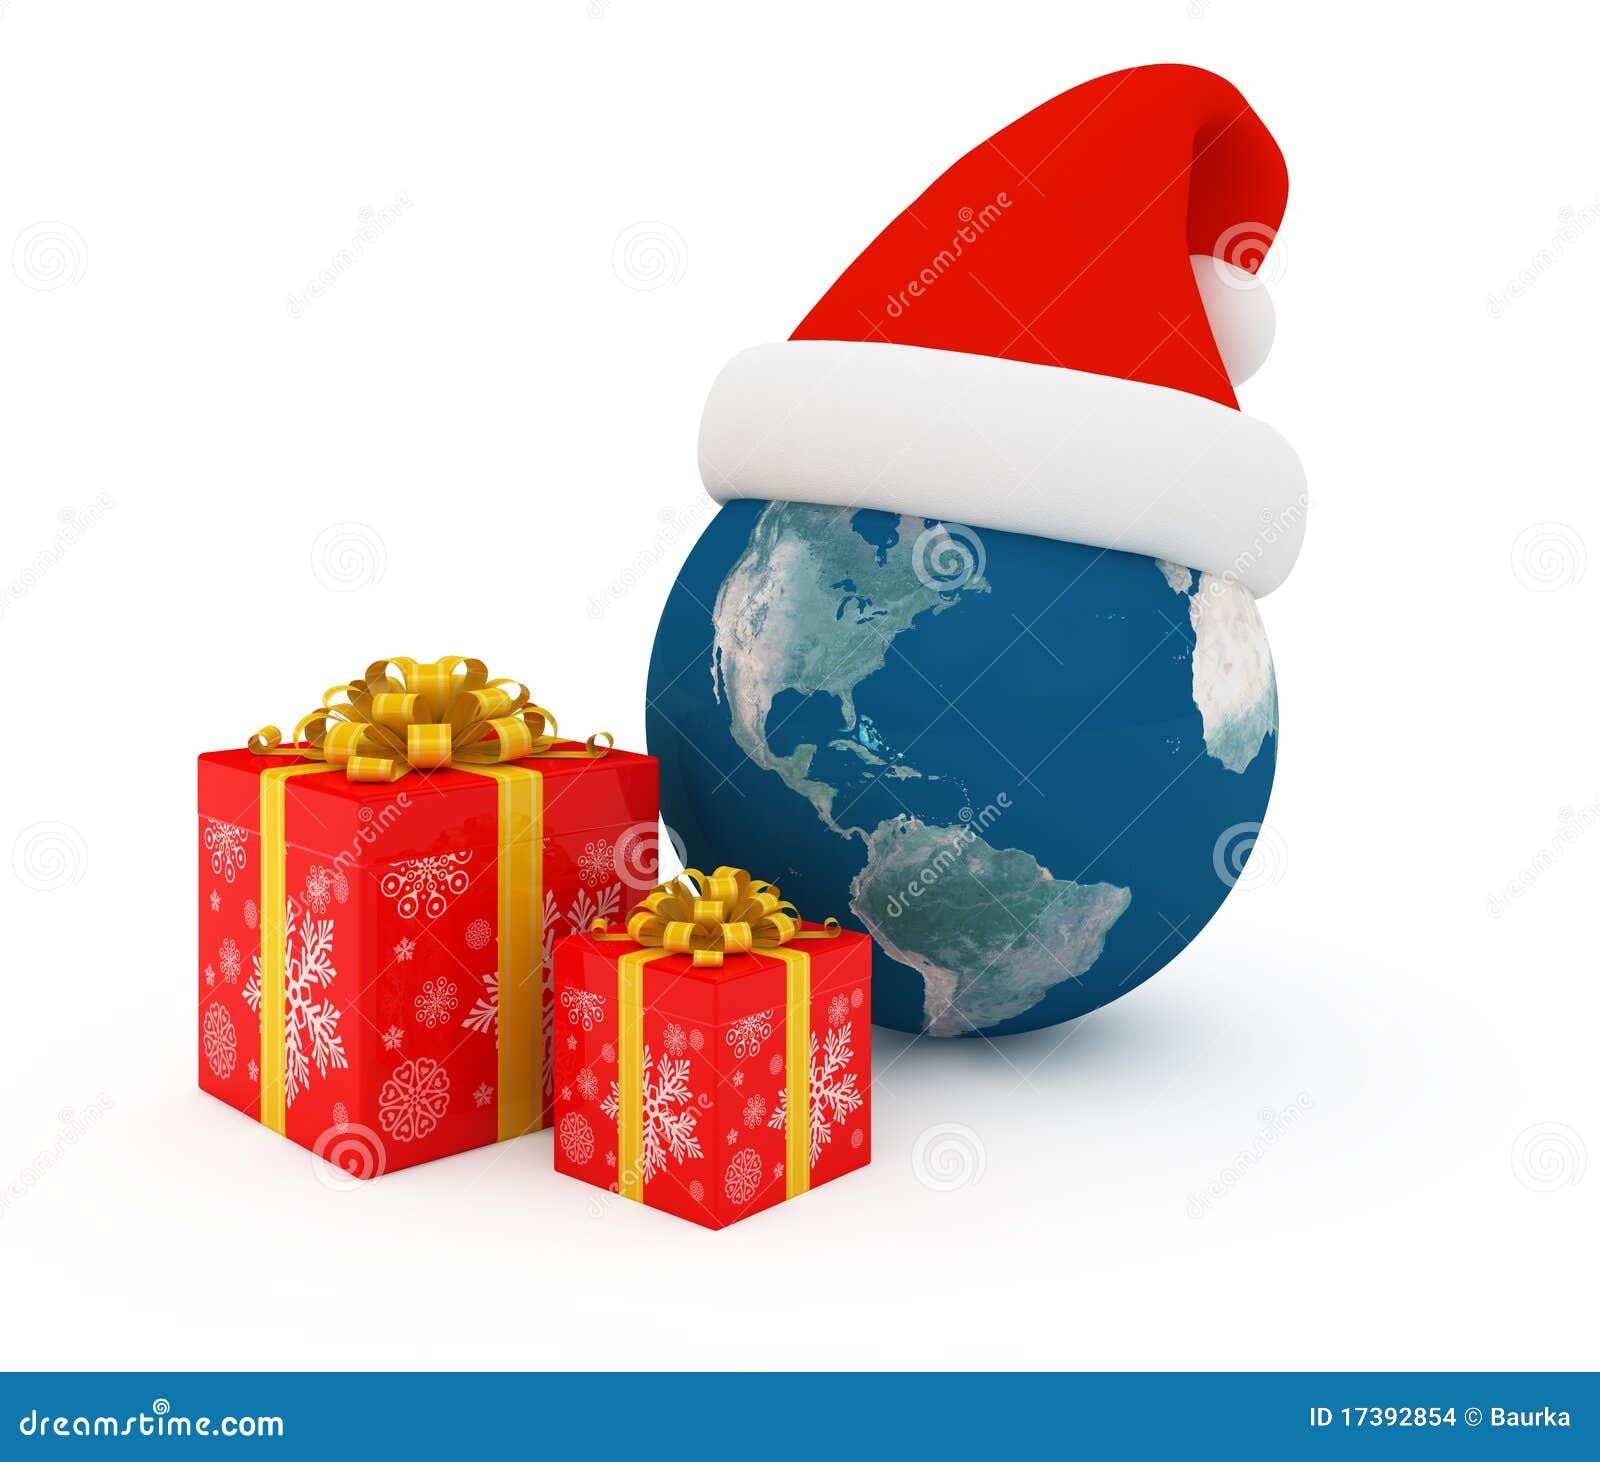 Worldwide Merry Christmas Celebration Stock Illustration Illustration Of Concept Golden 17392854